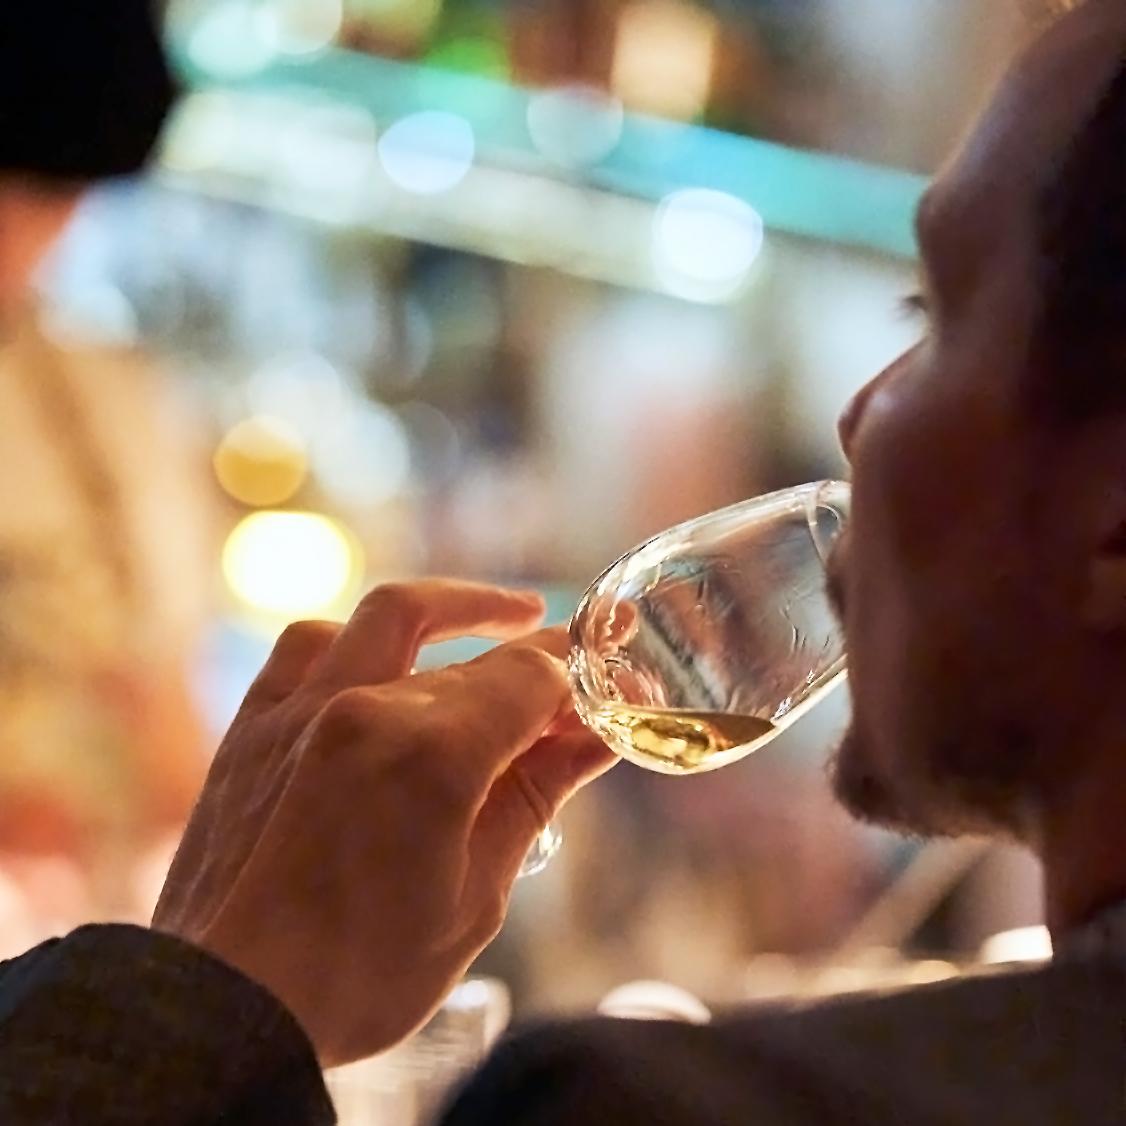 Eksklusiv whiskysmagning hos Stauning Whisky